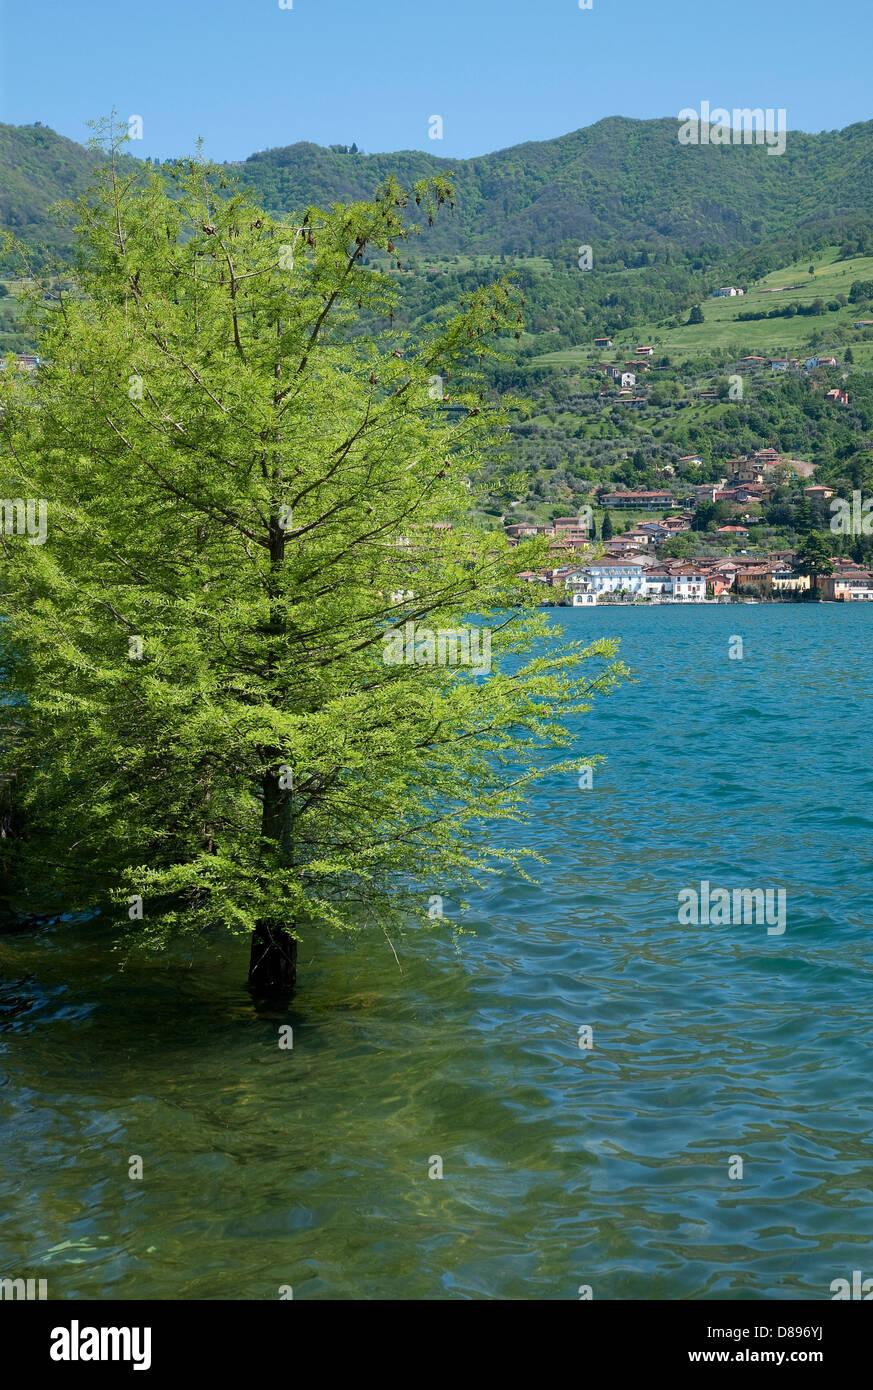 peschiera maraglio, monte isola, lake iseo, lombardy, italy - Stock Image